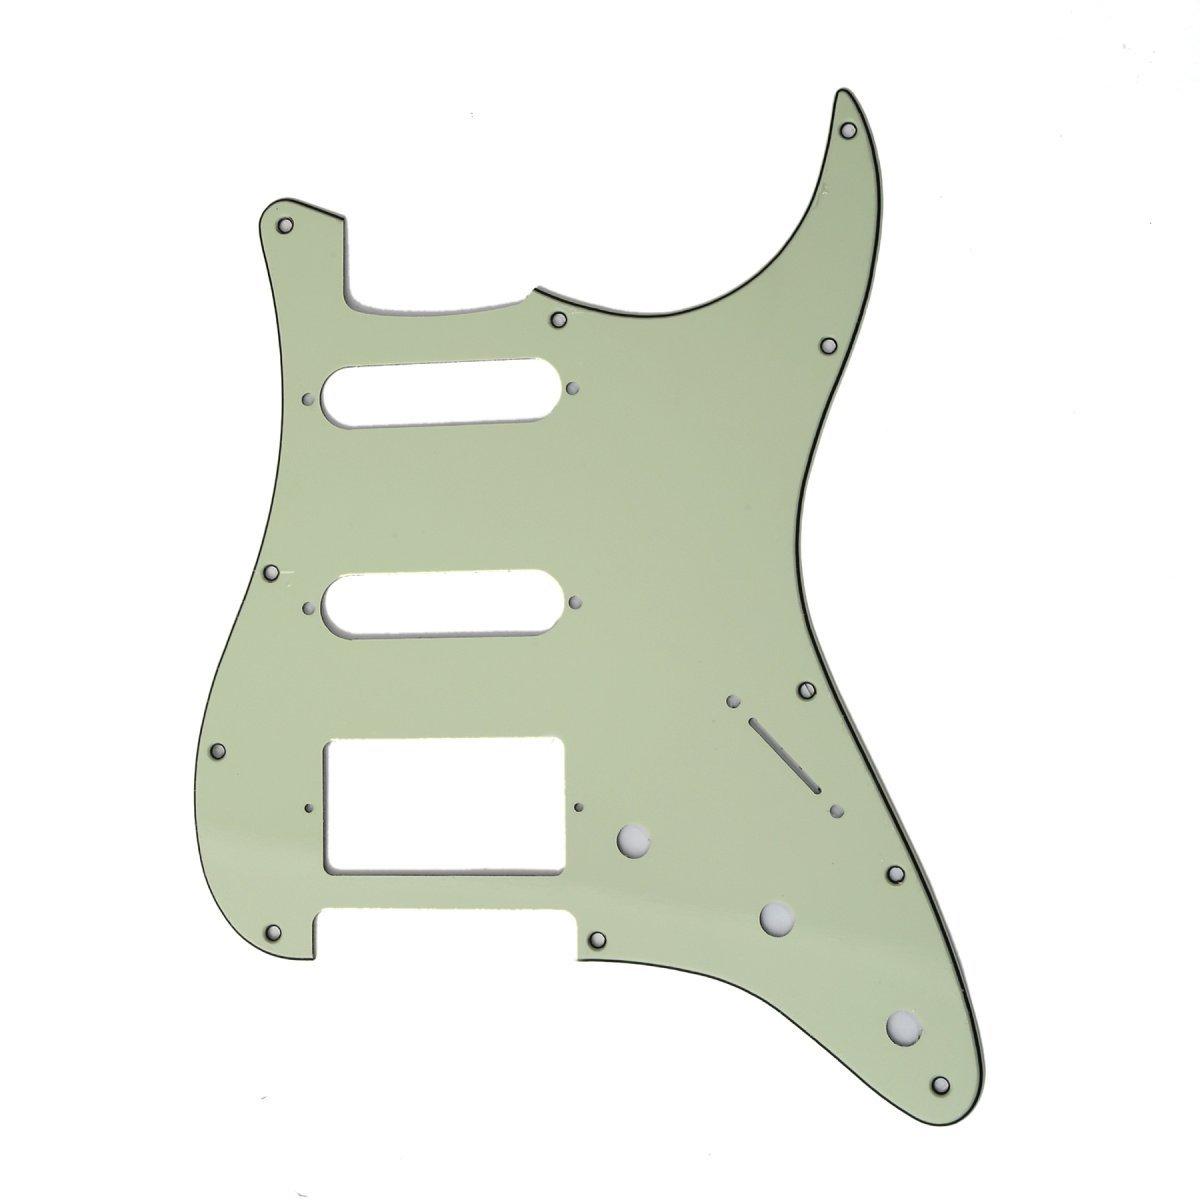 Musiclily SSH 11 Fori Strat Battipenna Chitarra Pickguard per Fender USA//Messico Stratocaster Standard Stile Moderno,4 strati Blue Pearl